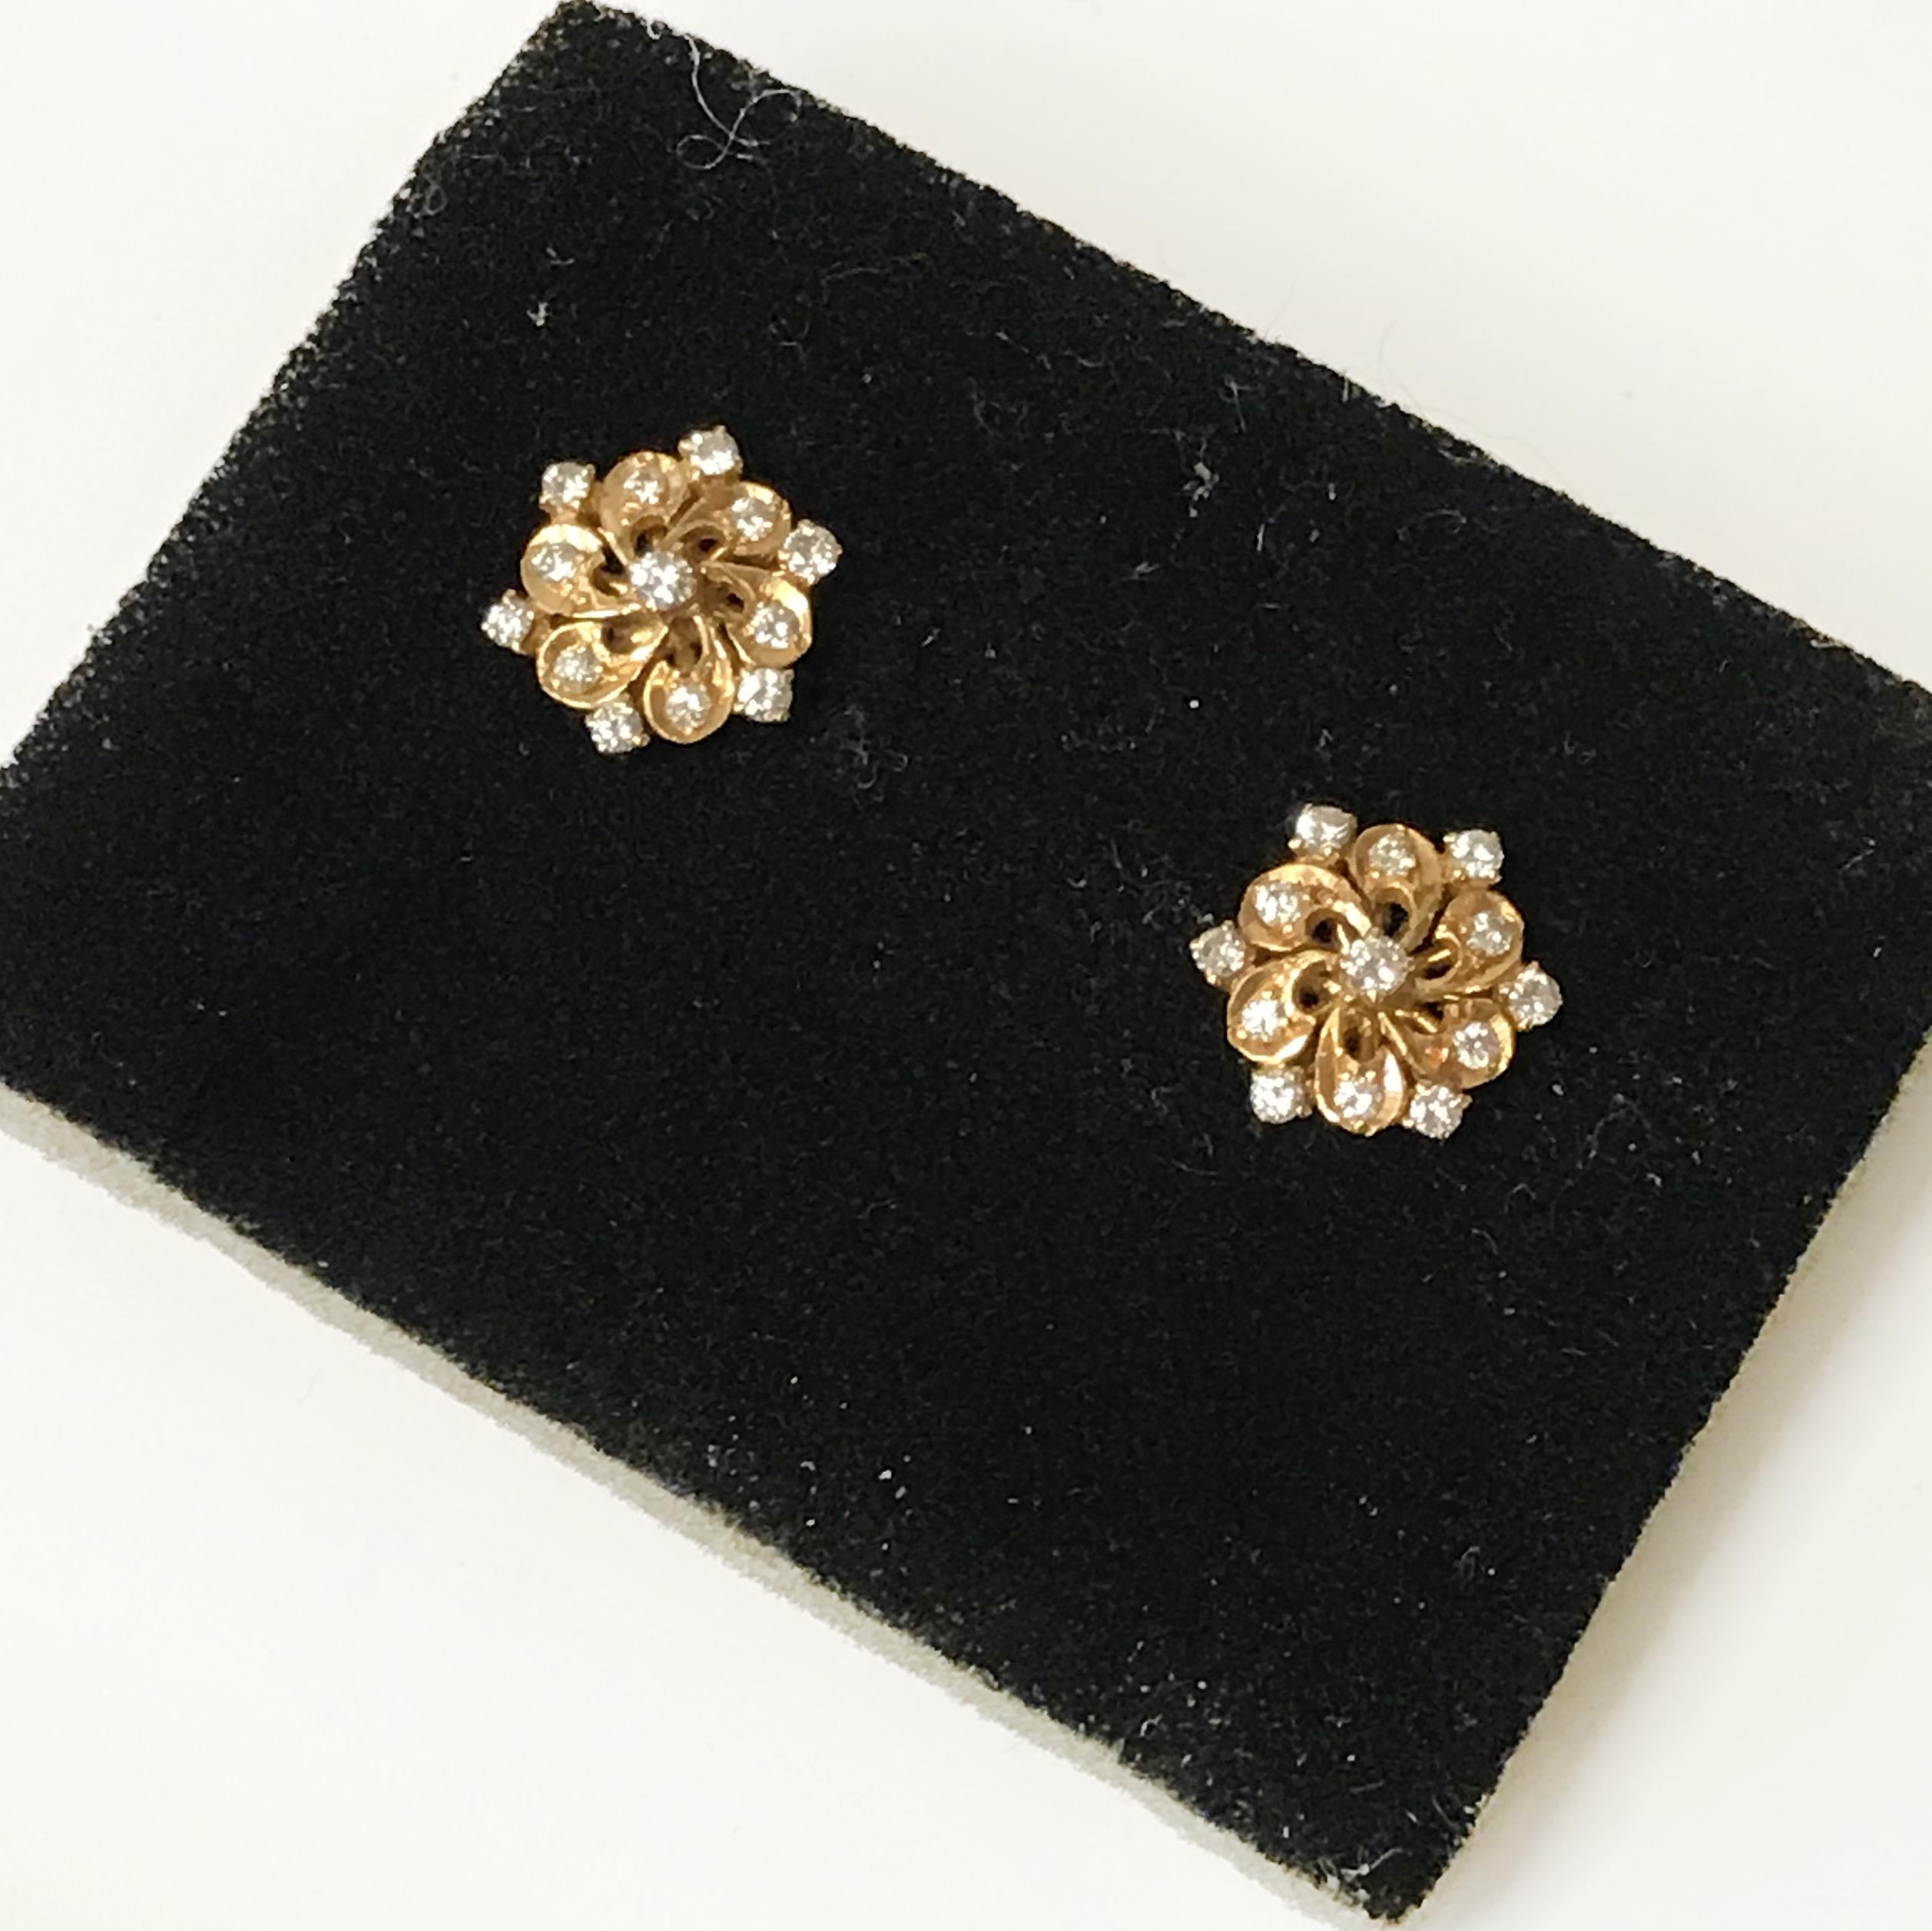 PAIR OF 21CT GOLD & DIAMOND SCREW BACKED EARRINGS